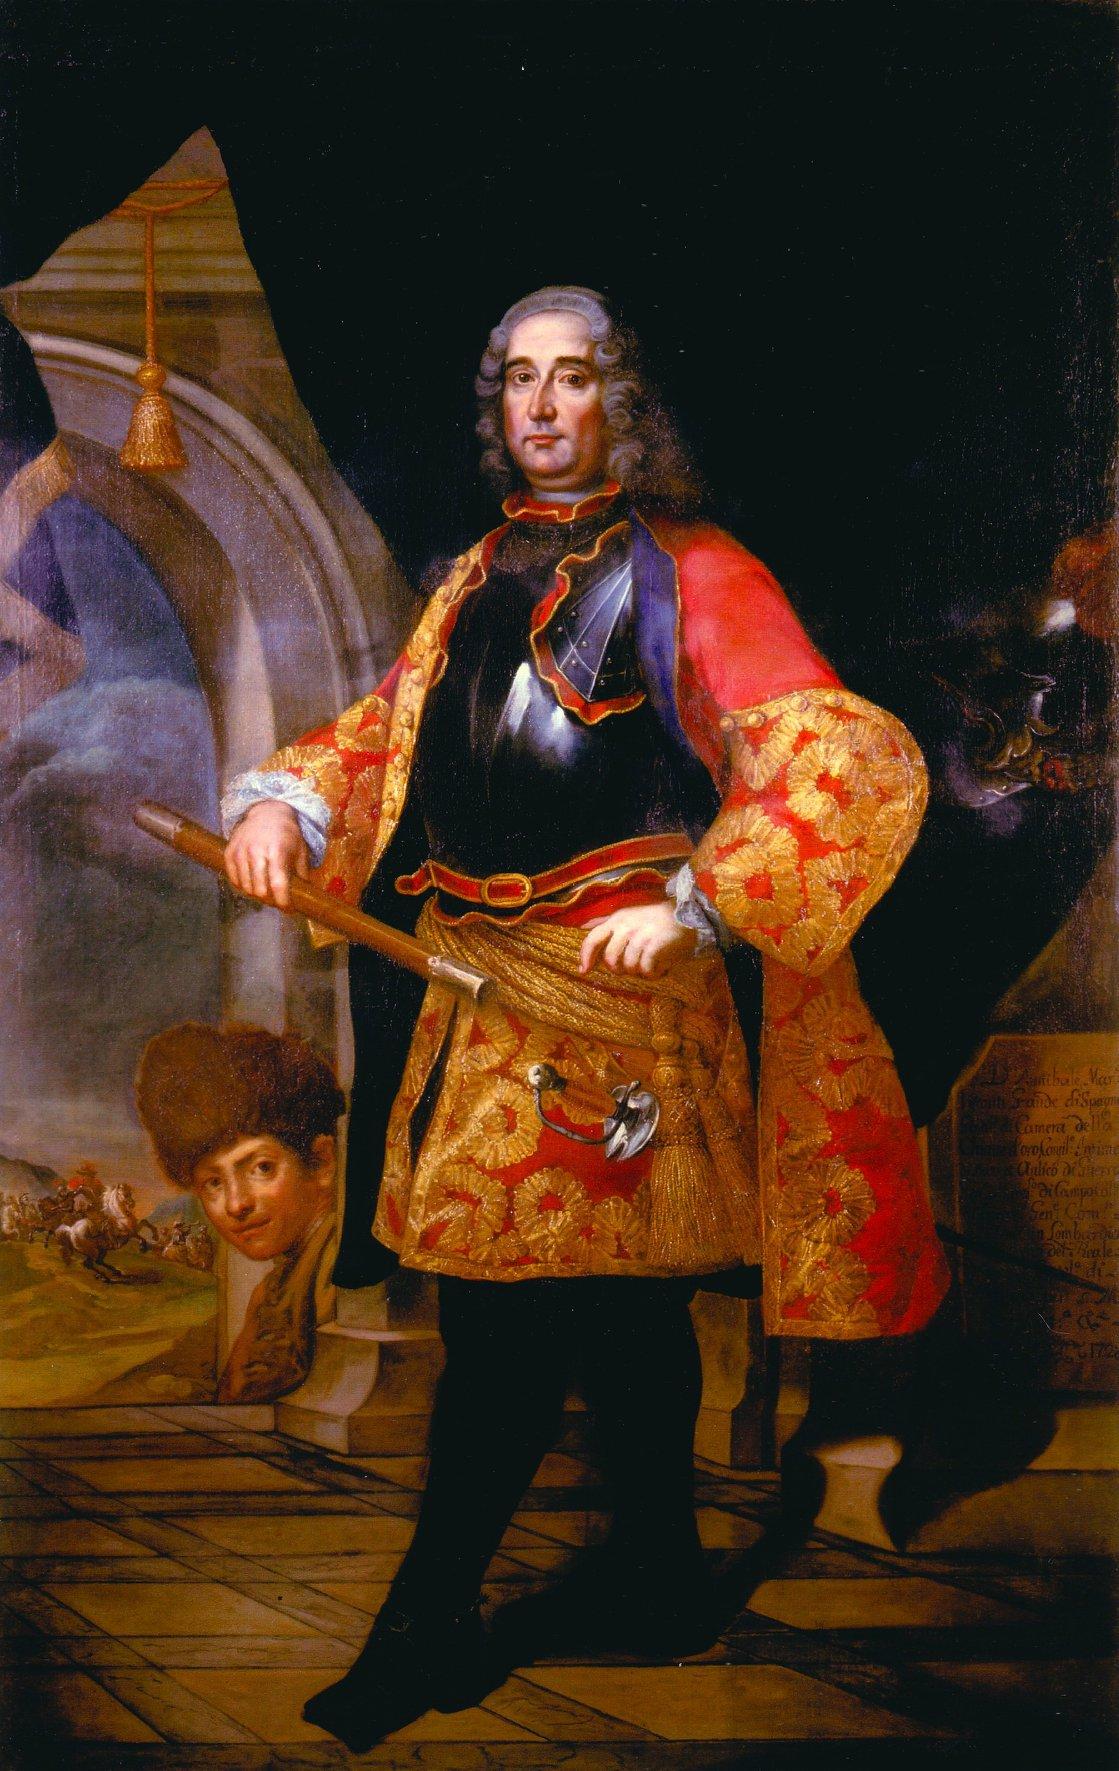 Аннибале Висконти, маркиз ди Боргоратто